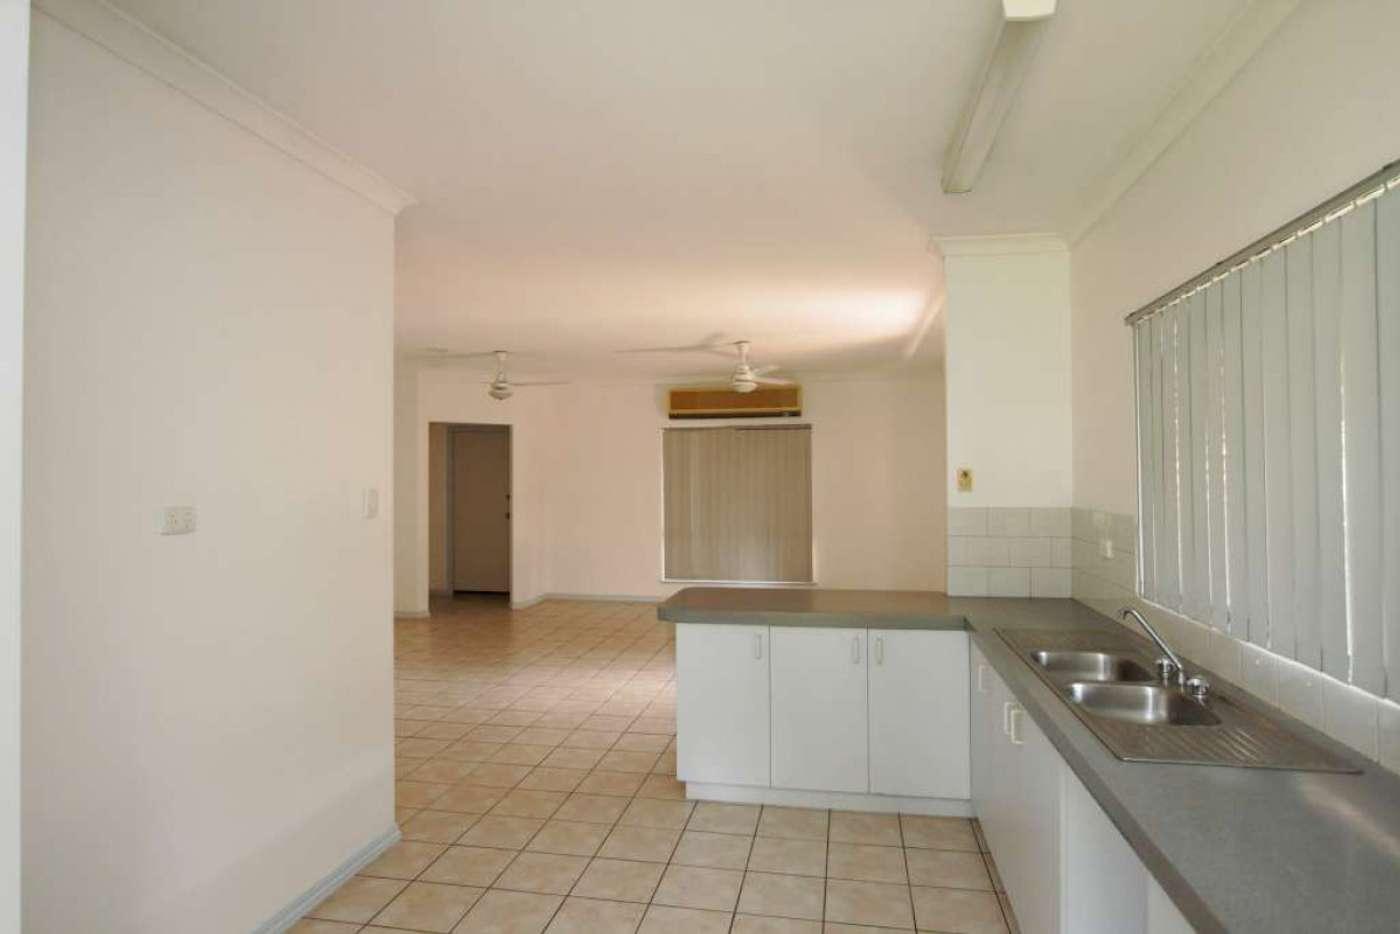 Sixth view of Homely house listing, 8A Plum Court, Kununurra WA 6743